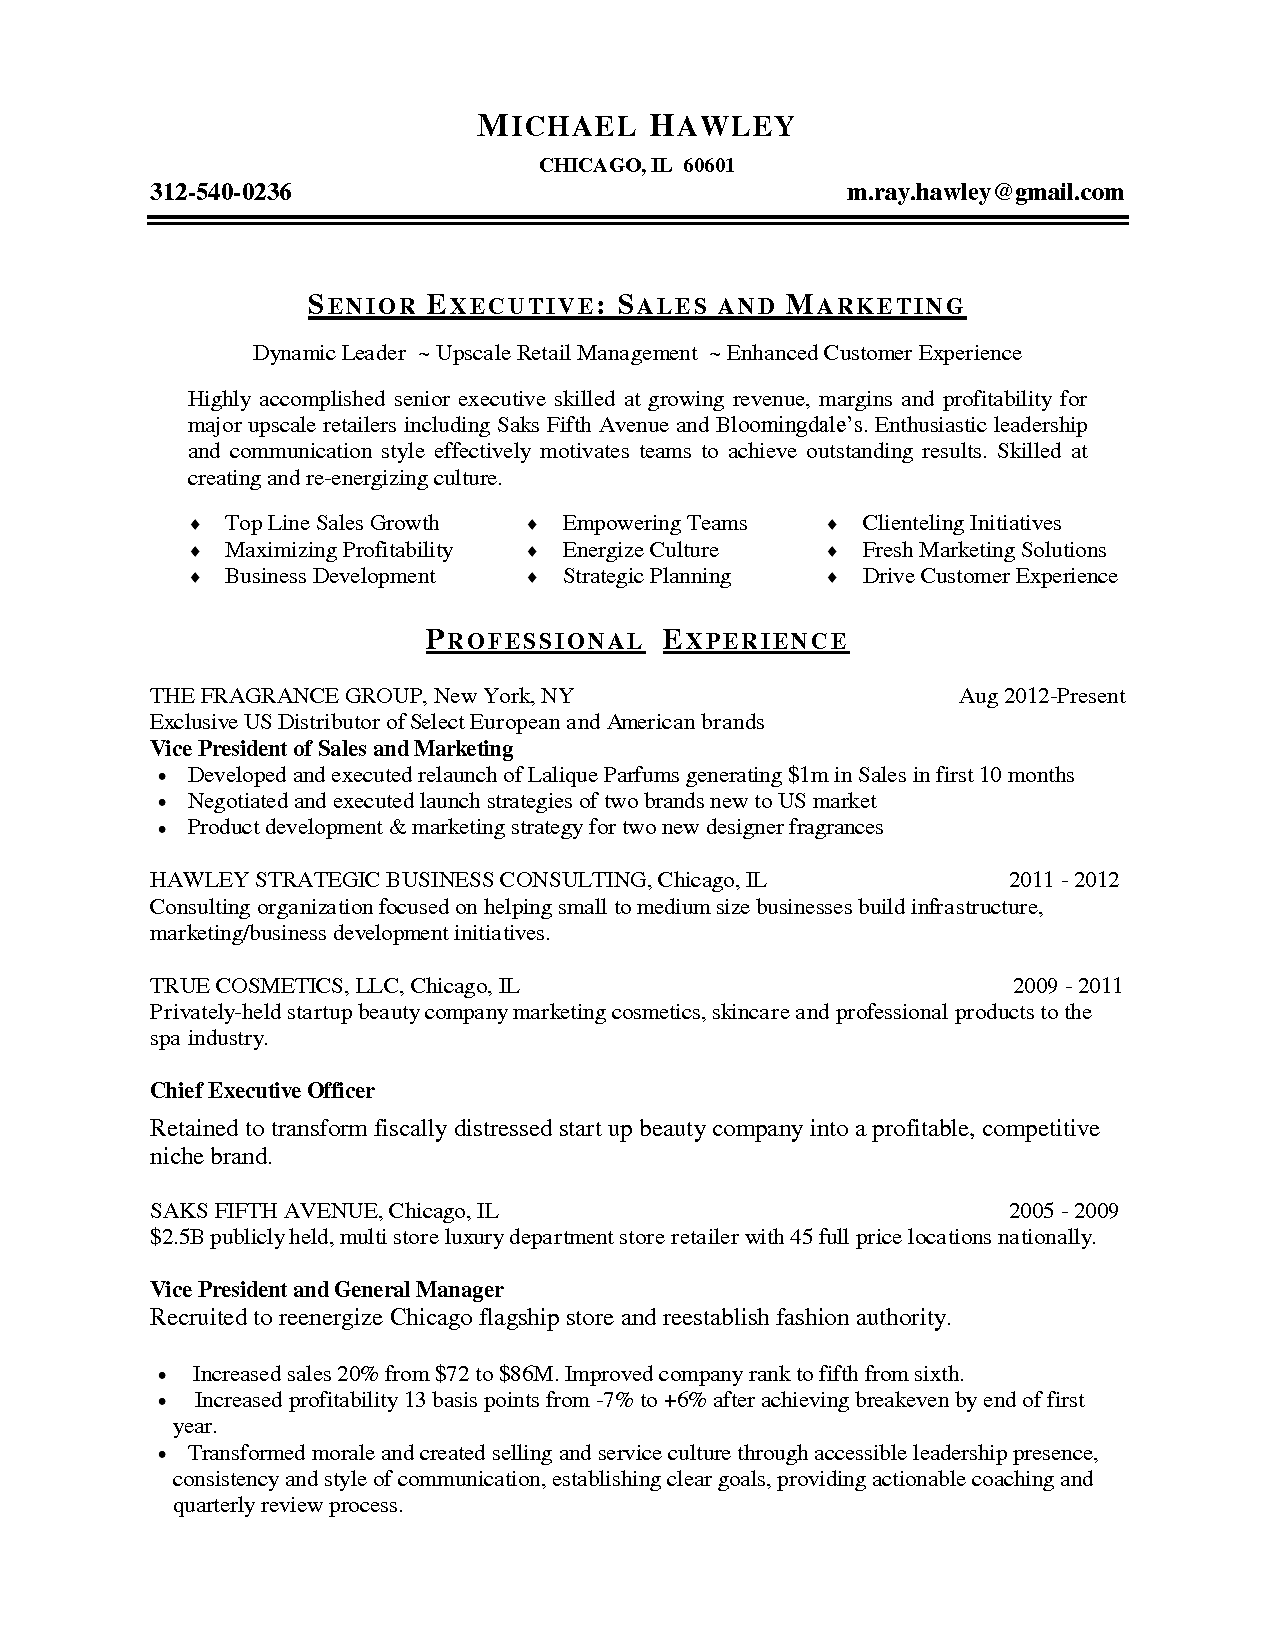 Cover letter business consultant job equity strategist cover letter brokerage clerk sample resume cover letter treasury samples for 2185b5188948d14dea46dddba7151ca7 733242383052911625 cover letter business consultant job madrichimfo Choice Image